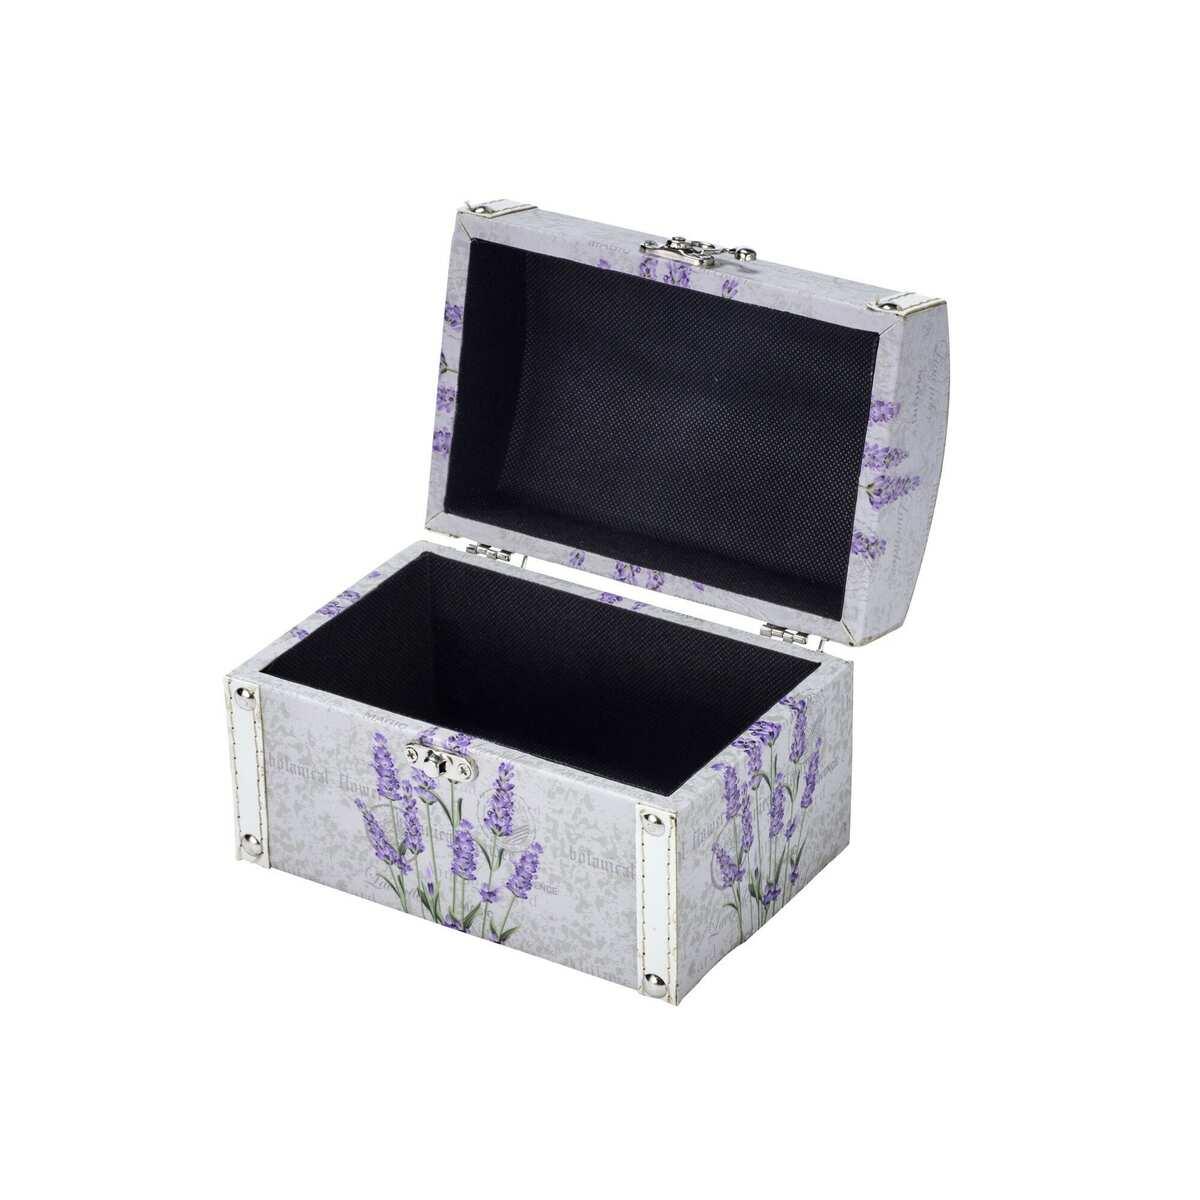 Bild 2 von Deko-Box in tollem Lavendel-Design